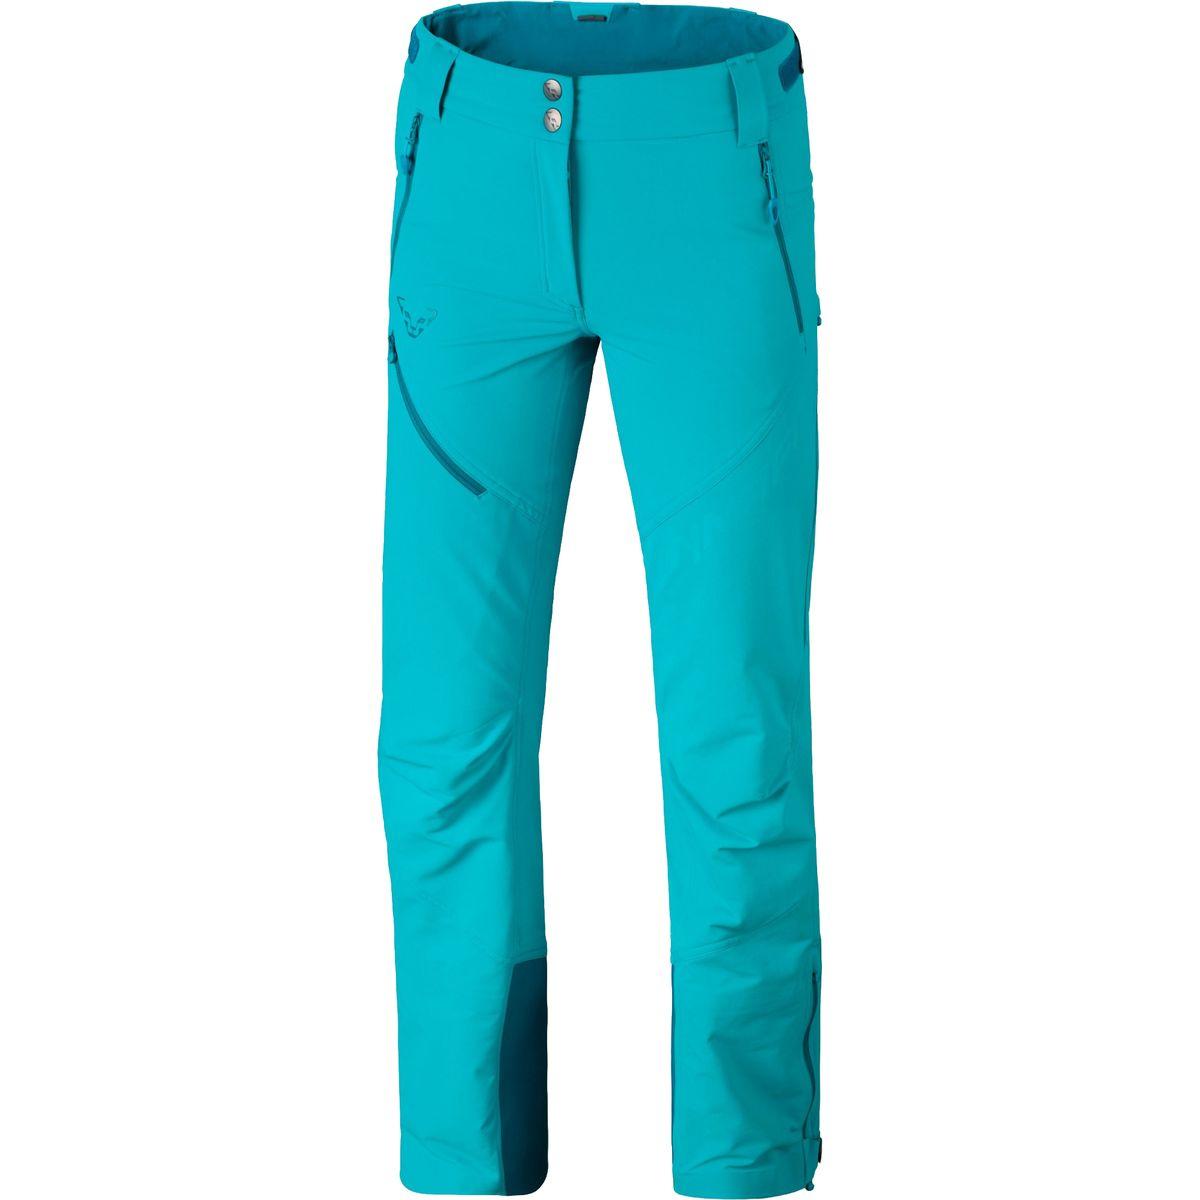 Dynafit Mercury DST Softshell Pant - Women